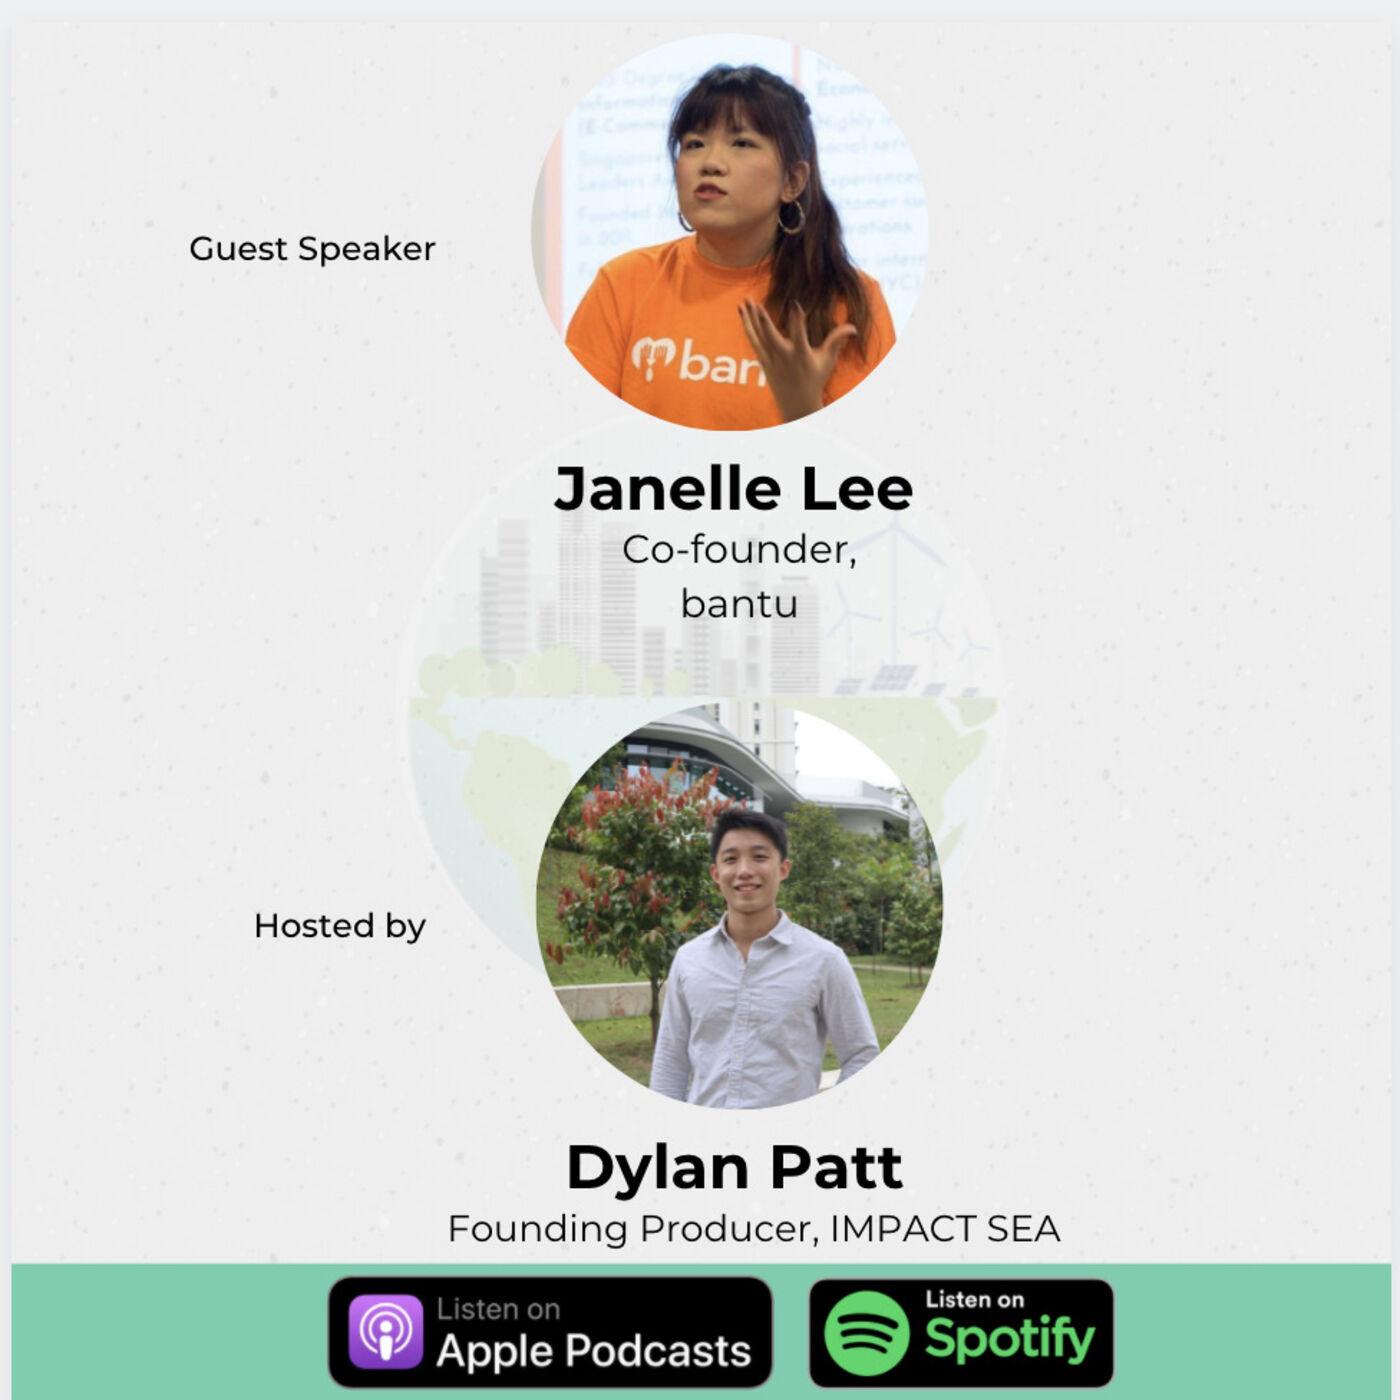 Driving Impact through the eyes of a Social Enterprise - Janelle Lee, bantu